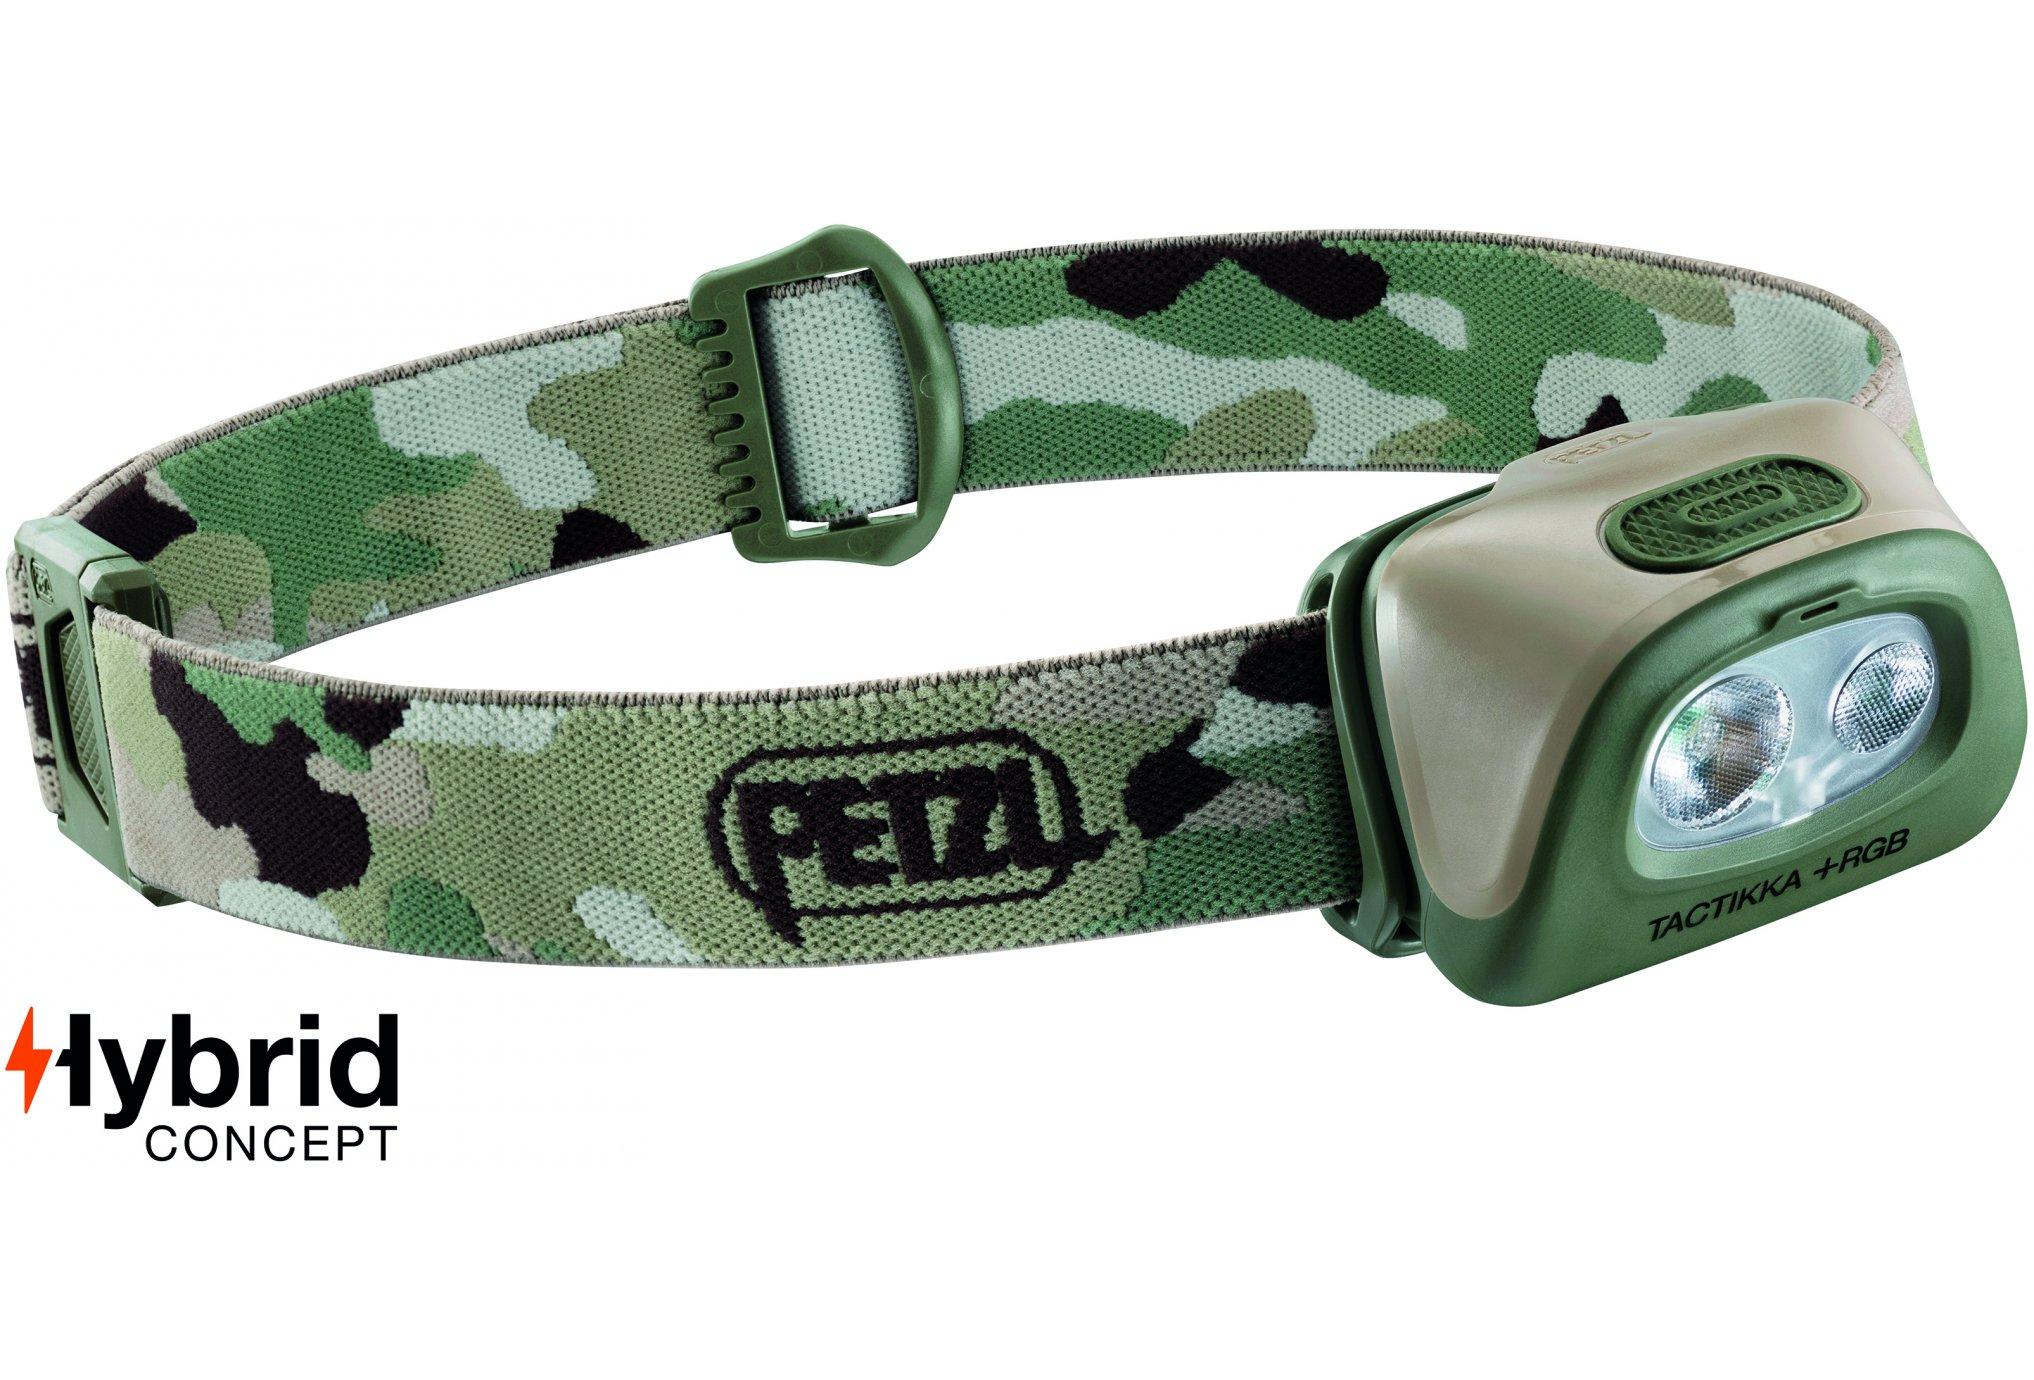 Petzl Tactikka + RGB - 350 lumens Lampe frontale / éclairage